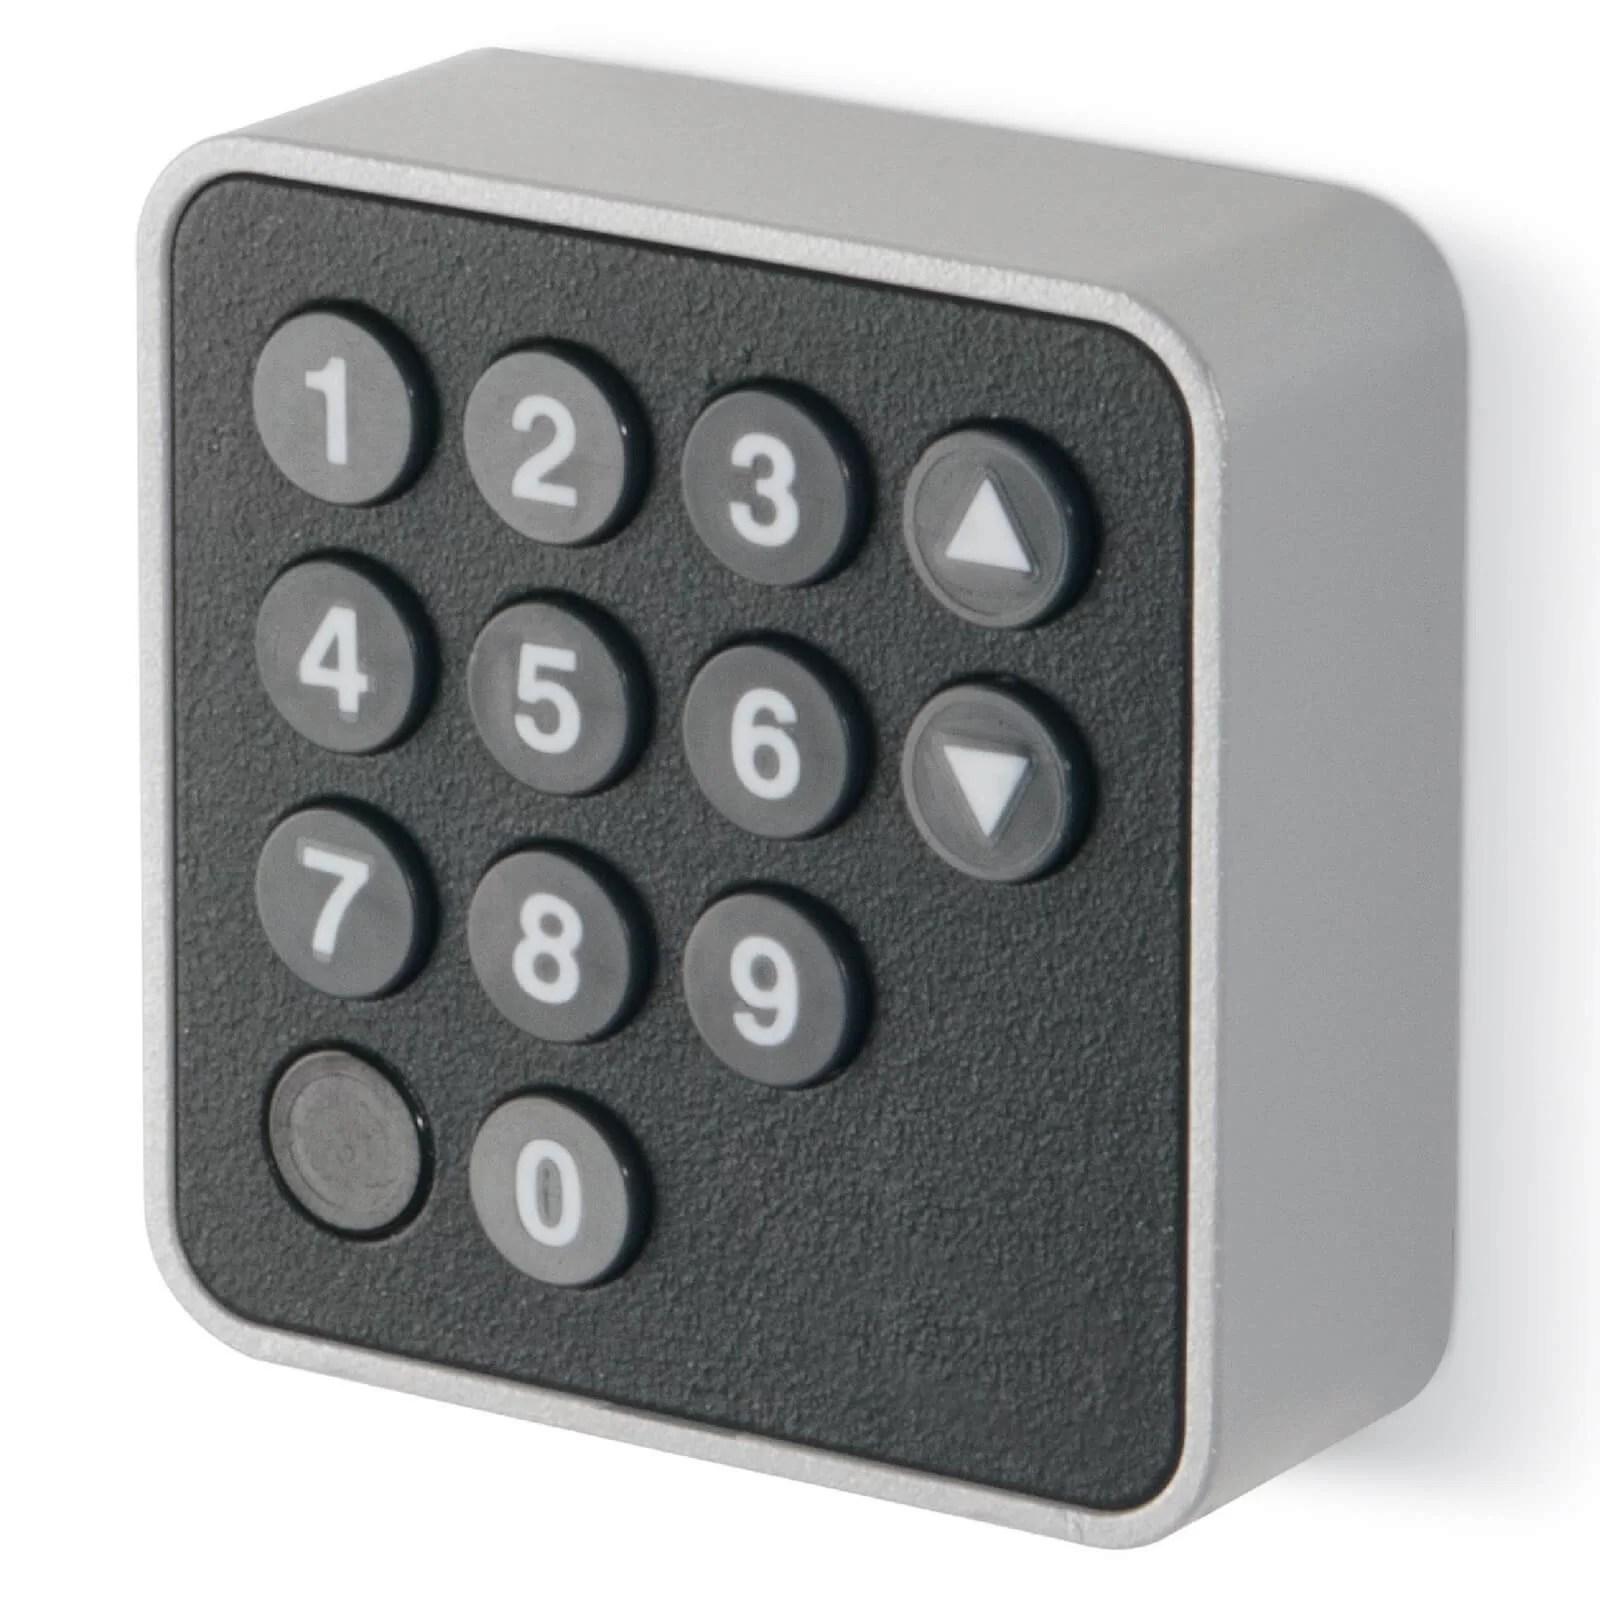 Selettore numerico via radio